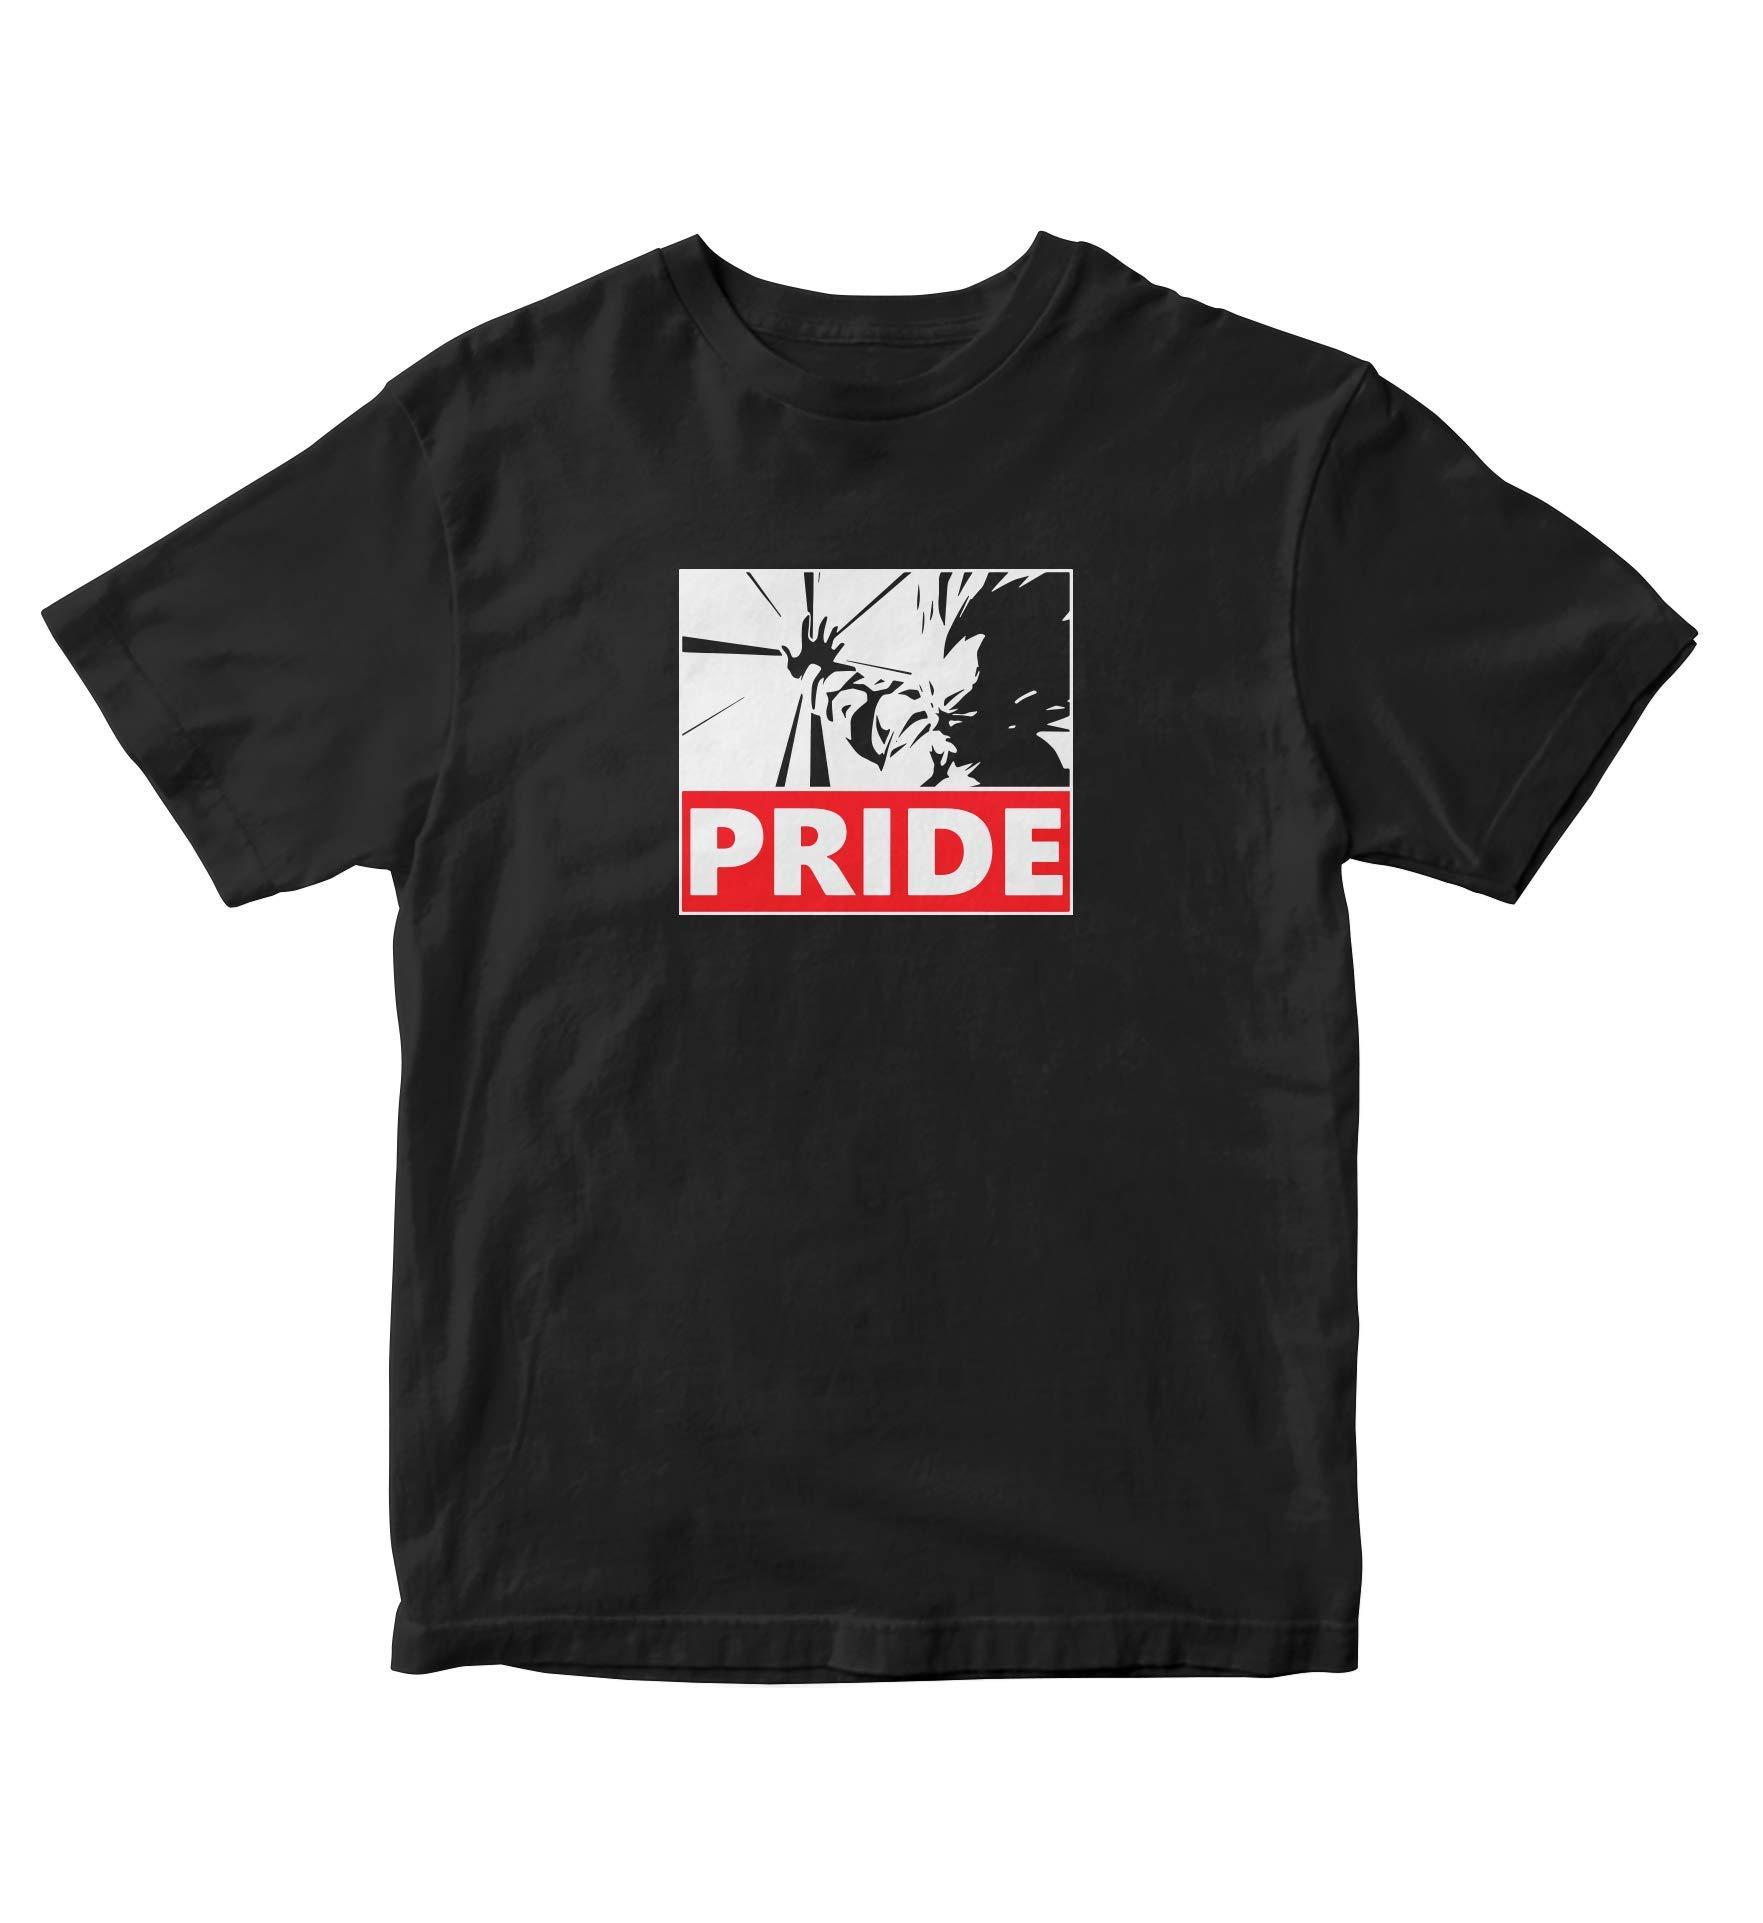 Tjsports Prince Vegeta Shirt Pride Dbz Anime Manga Black Shirt S A713